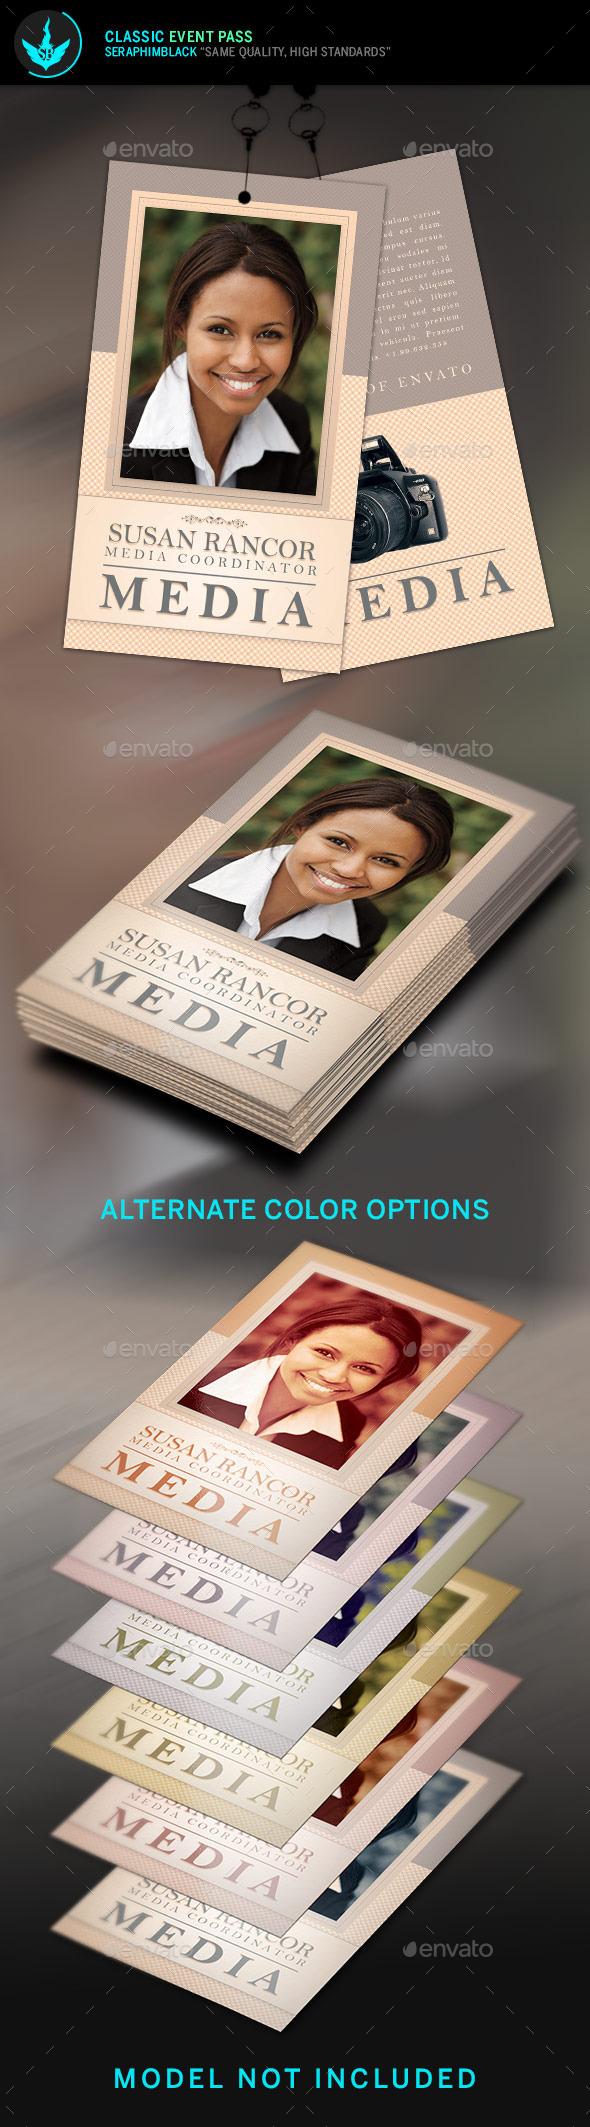 Classic Media Credentials Template - Miscellaneous Print Templates